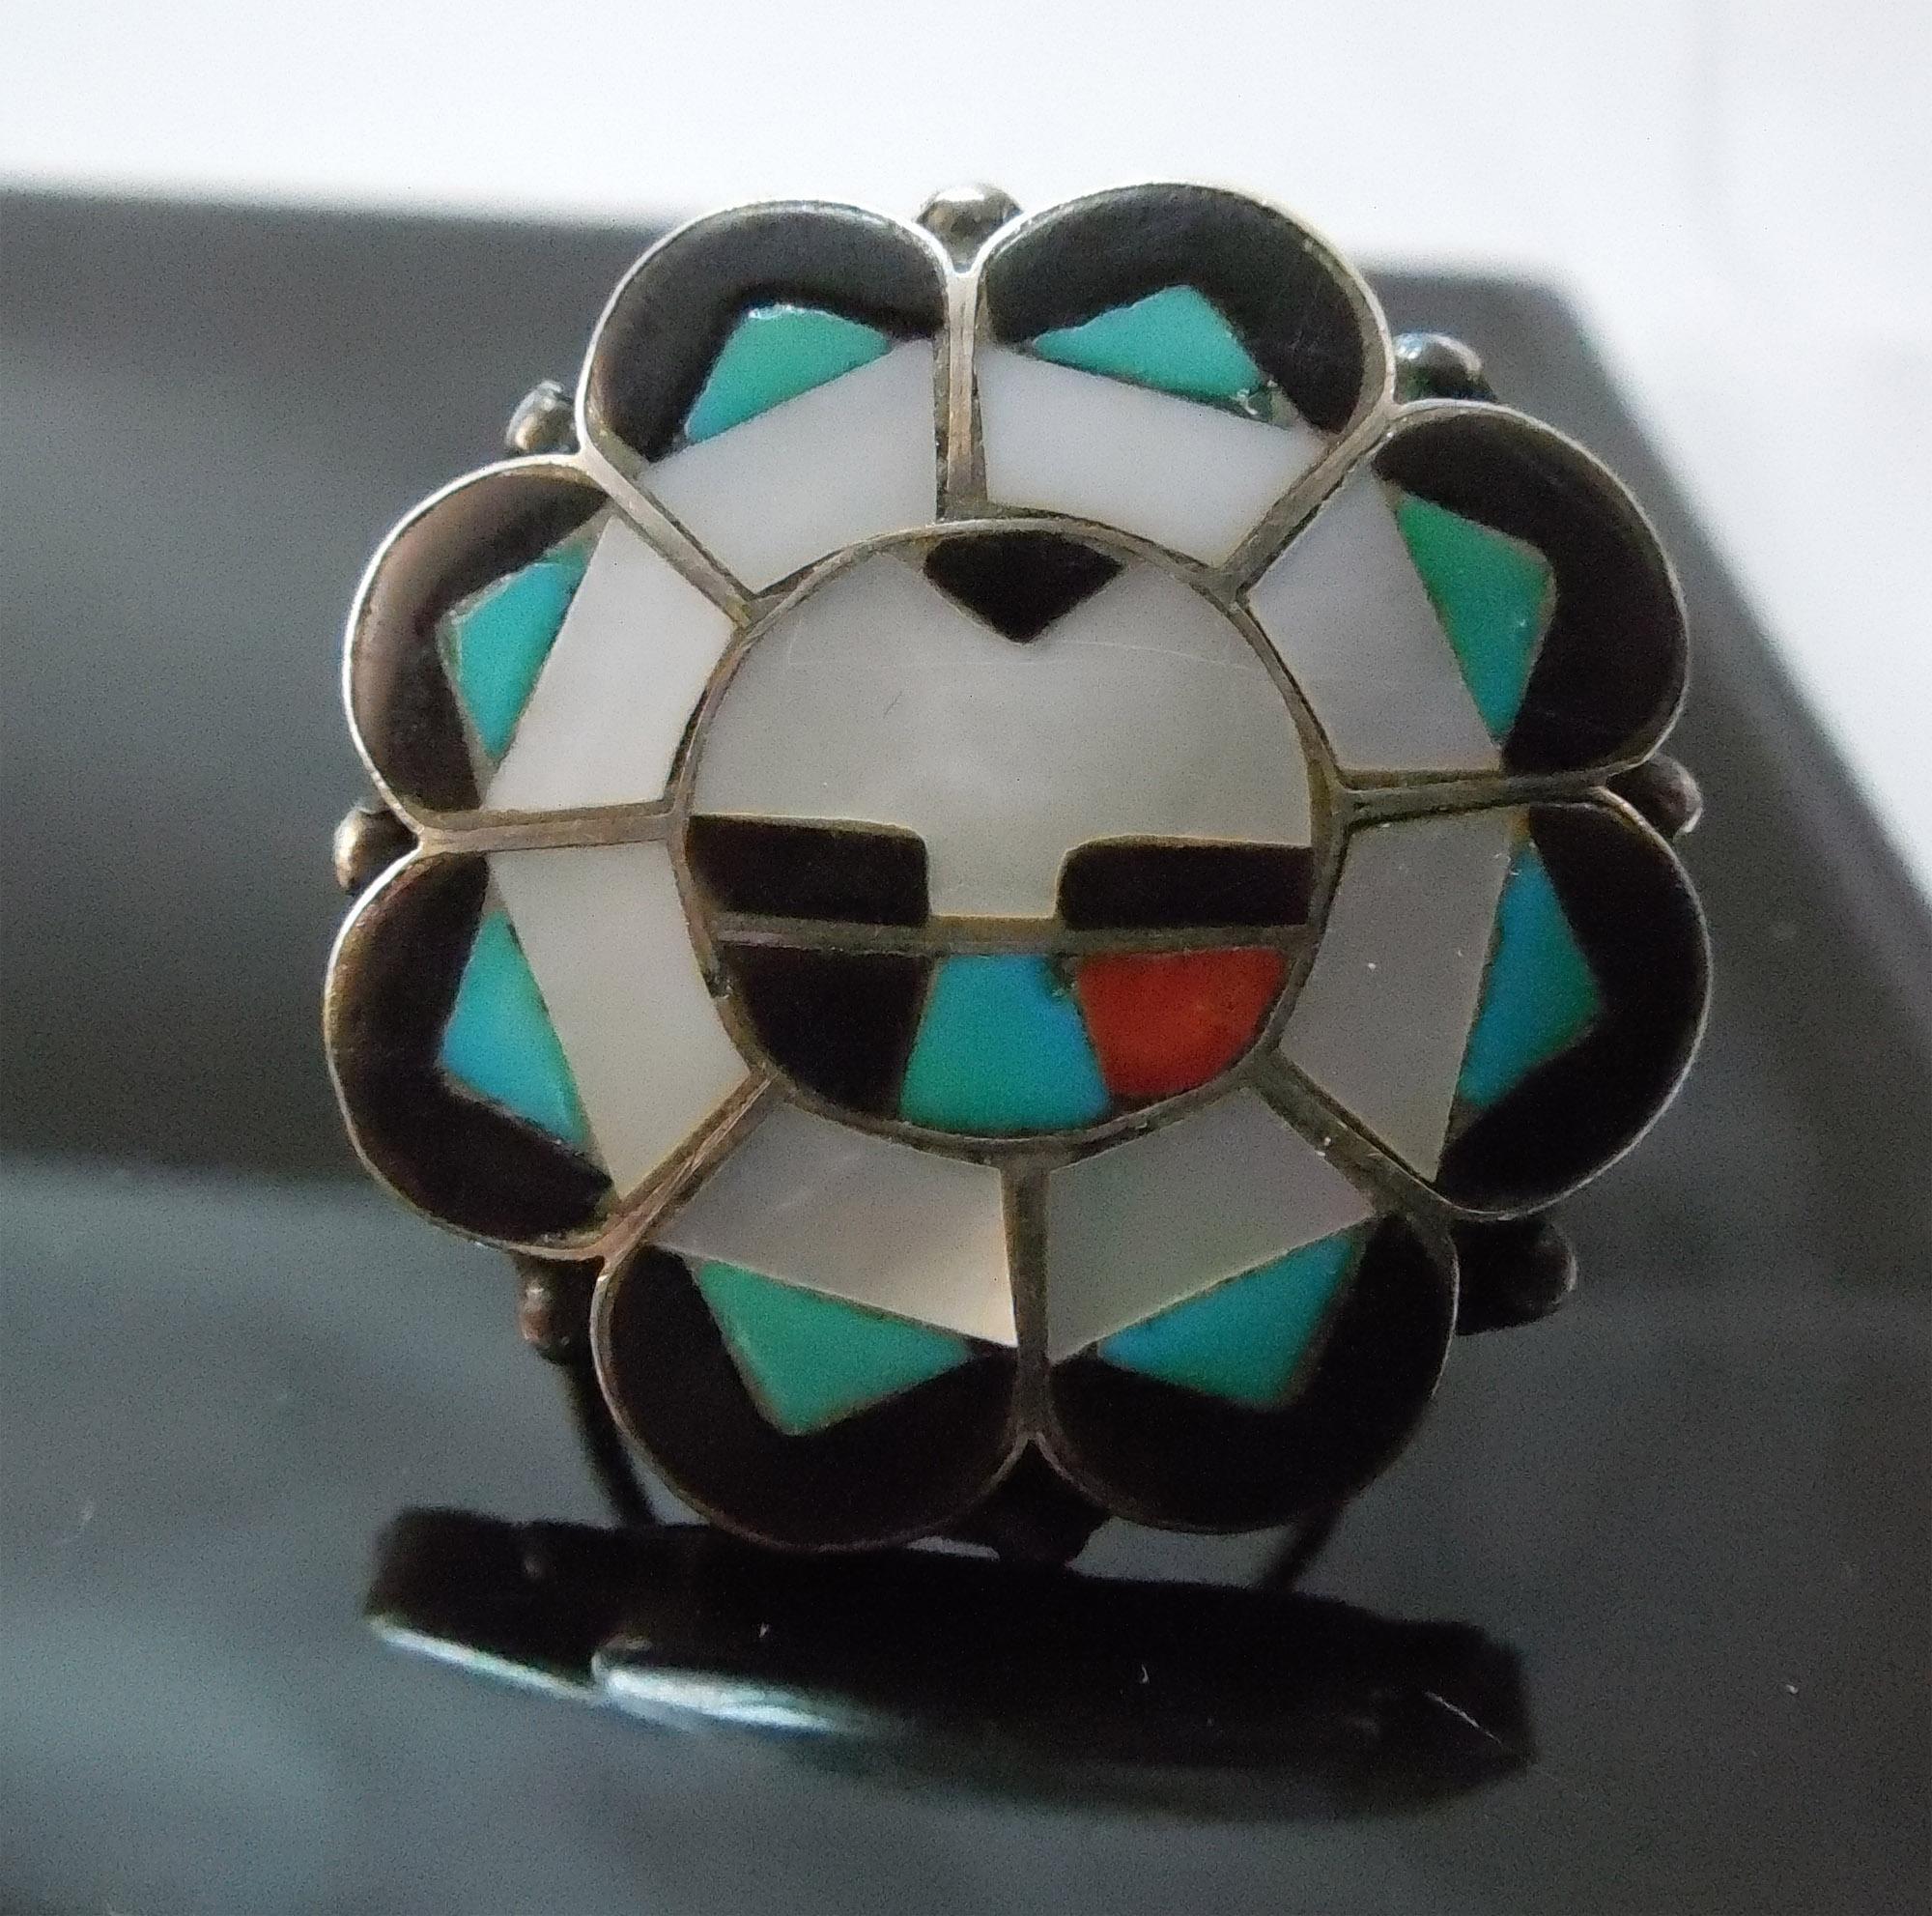 Vintage Native American Zuni Sun God Ring - Large Size - Nice Detail!